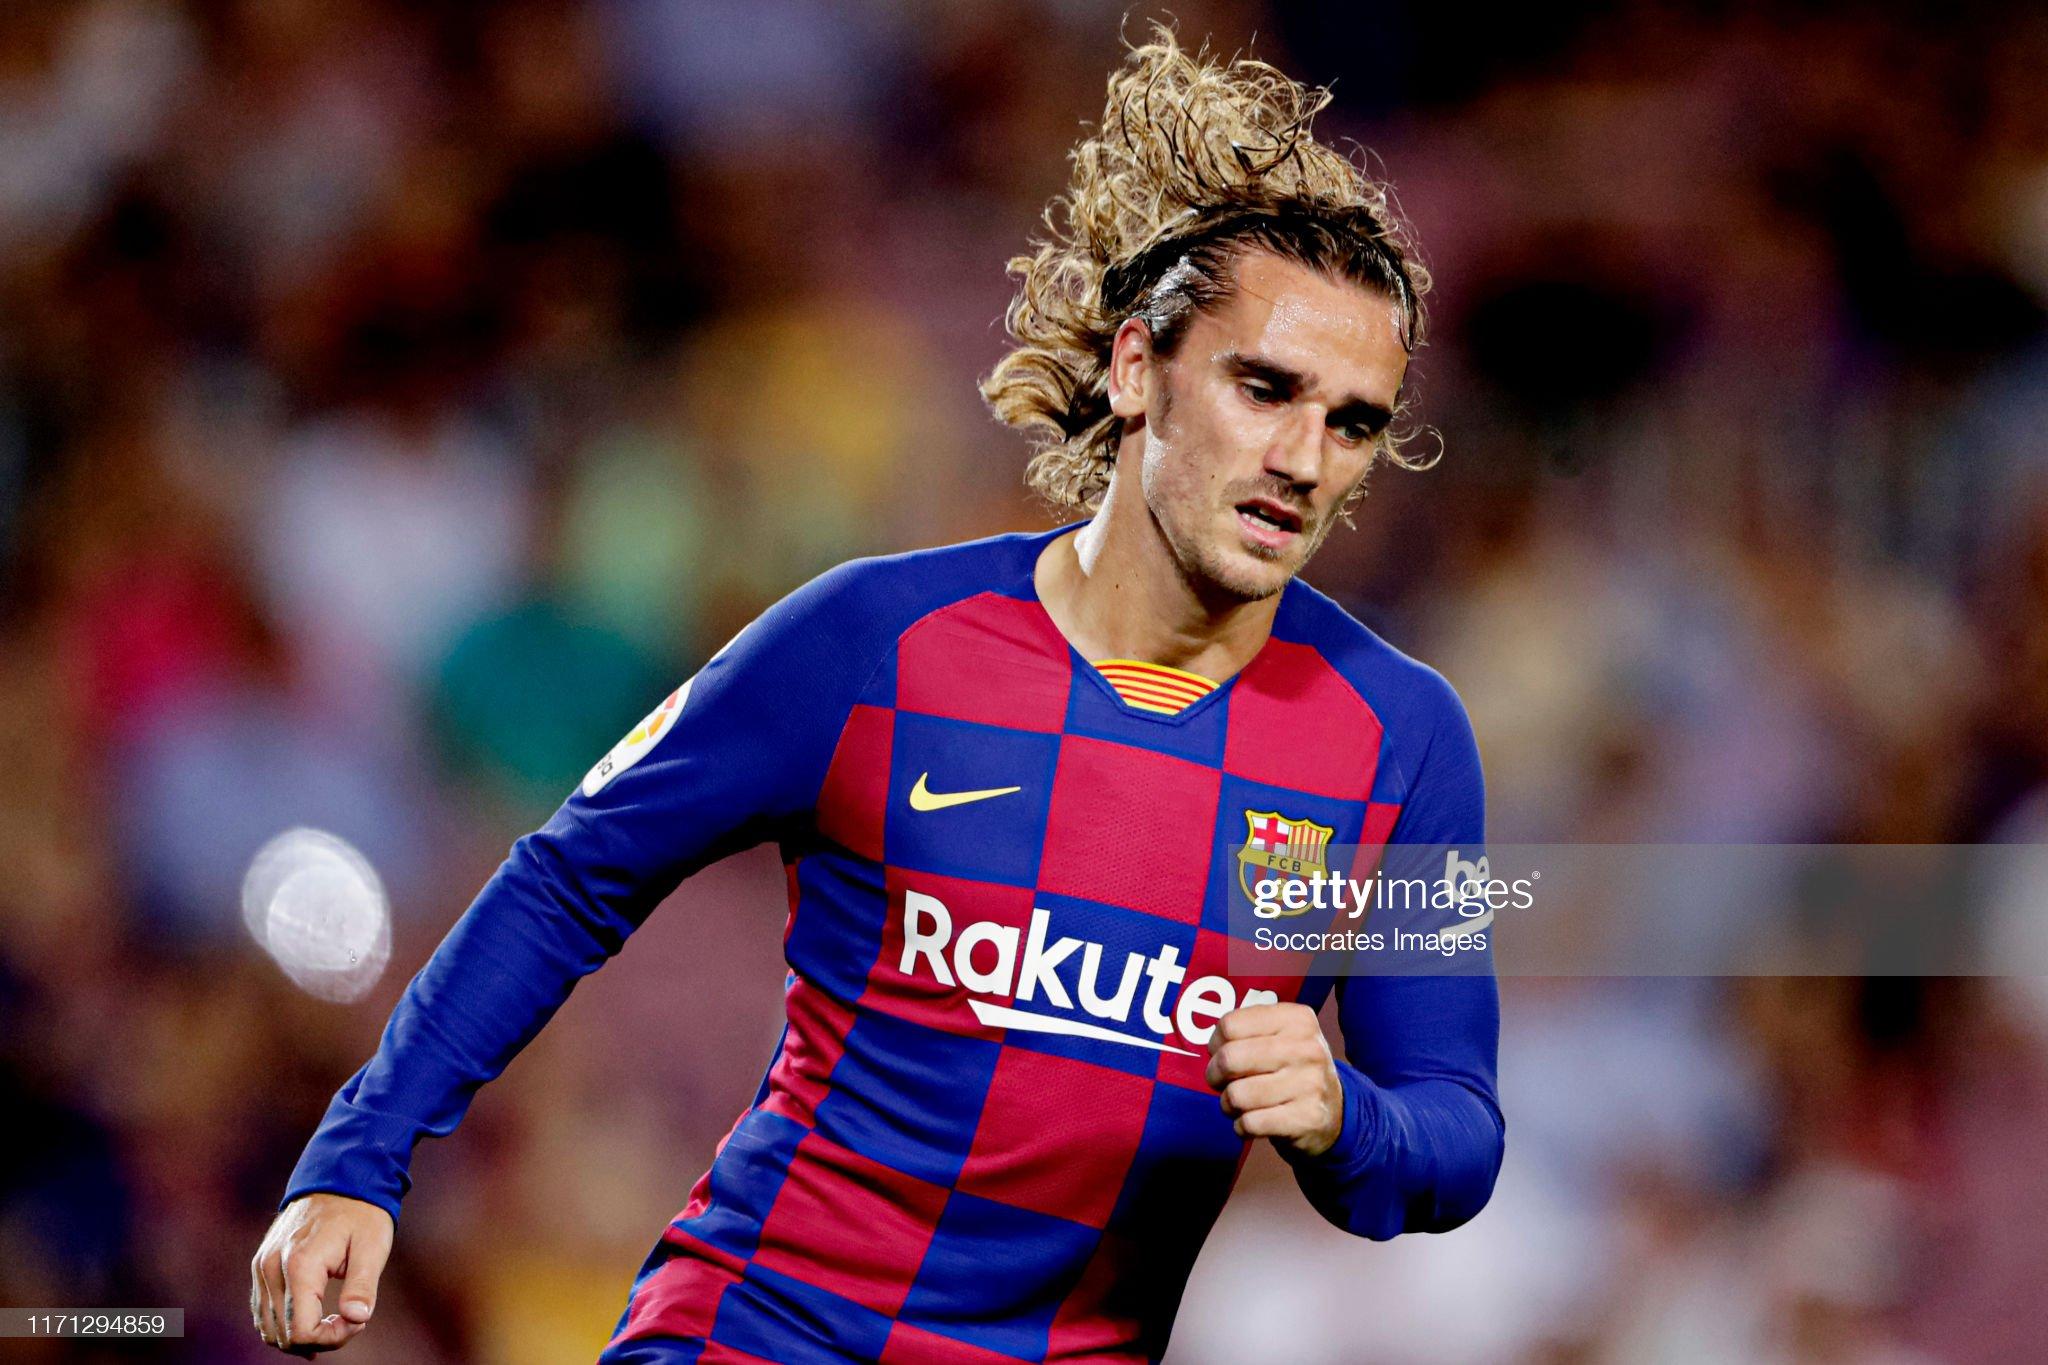 صور مباراة : برشلونة - فياريال 2-1 ( 24-09-2019 )  Antoine-griezmann-of-fc-barcelona-during-the-la-liga-santander-match-picture-id1171294859?s=2048x2048